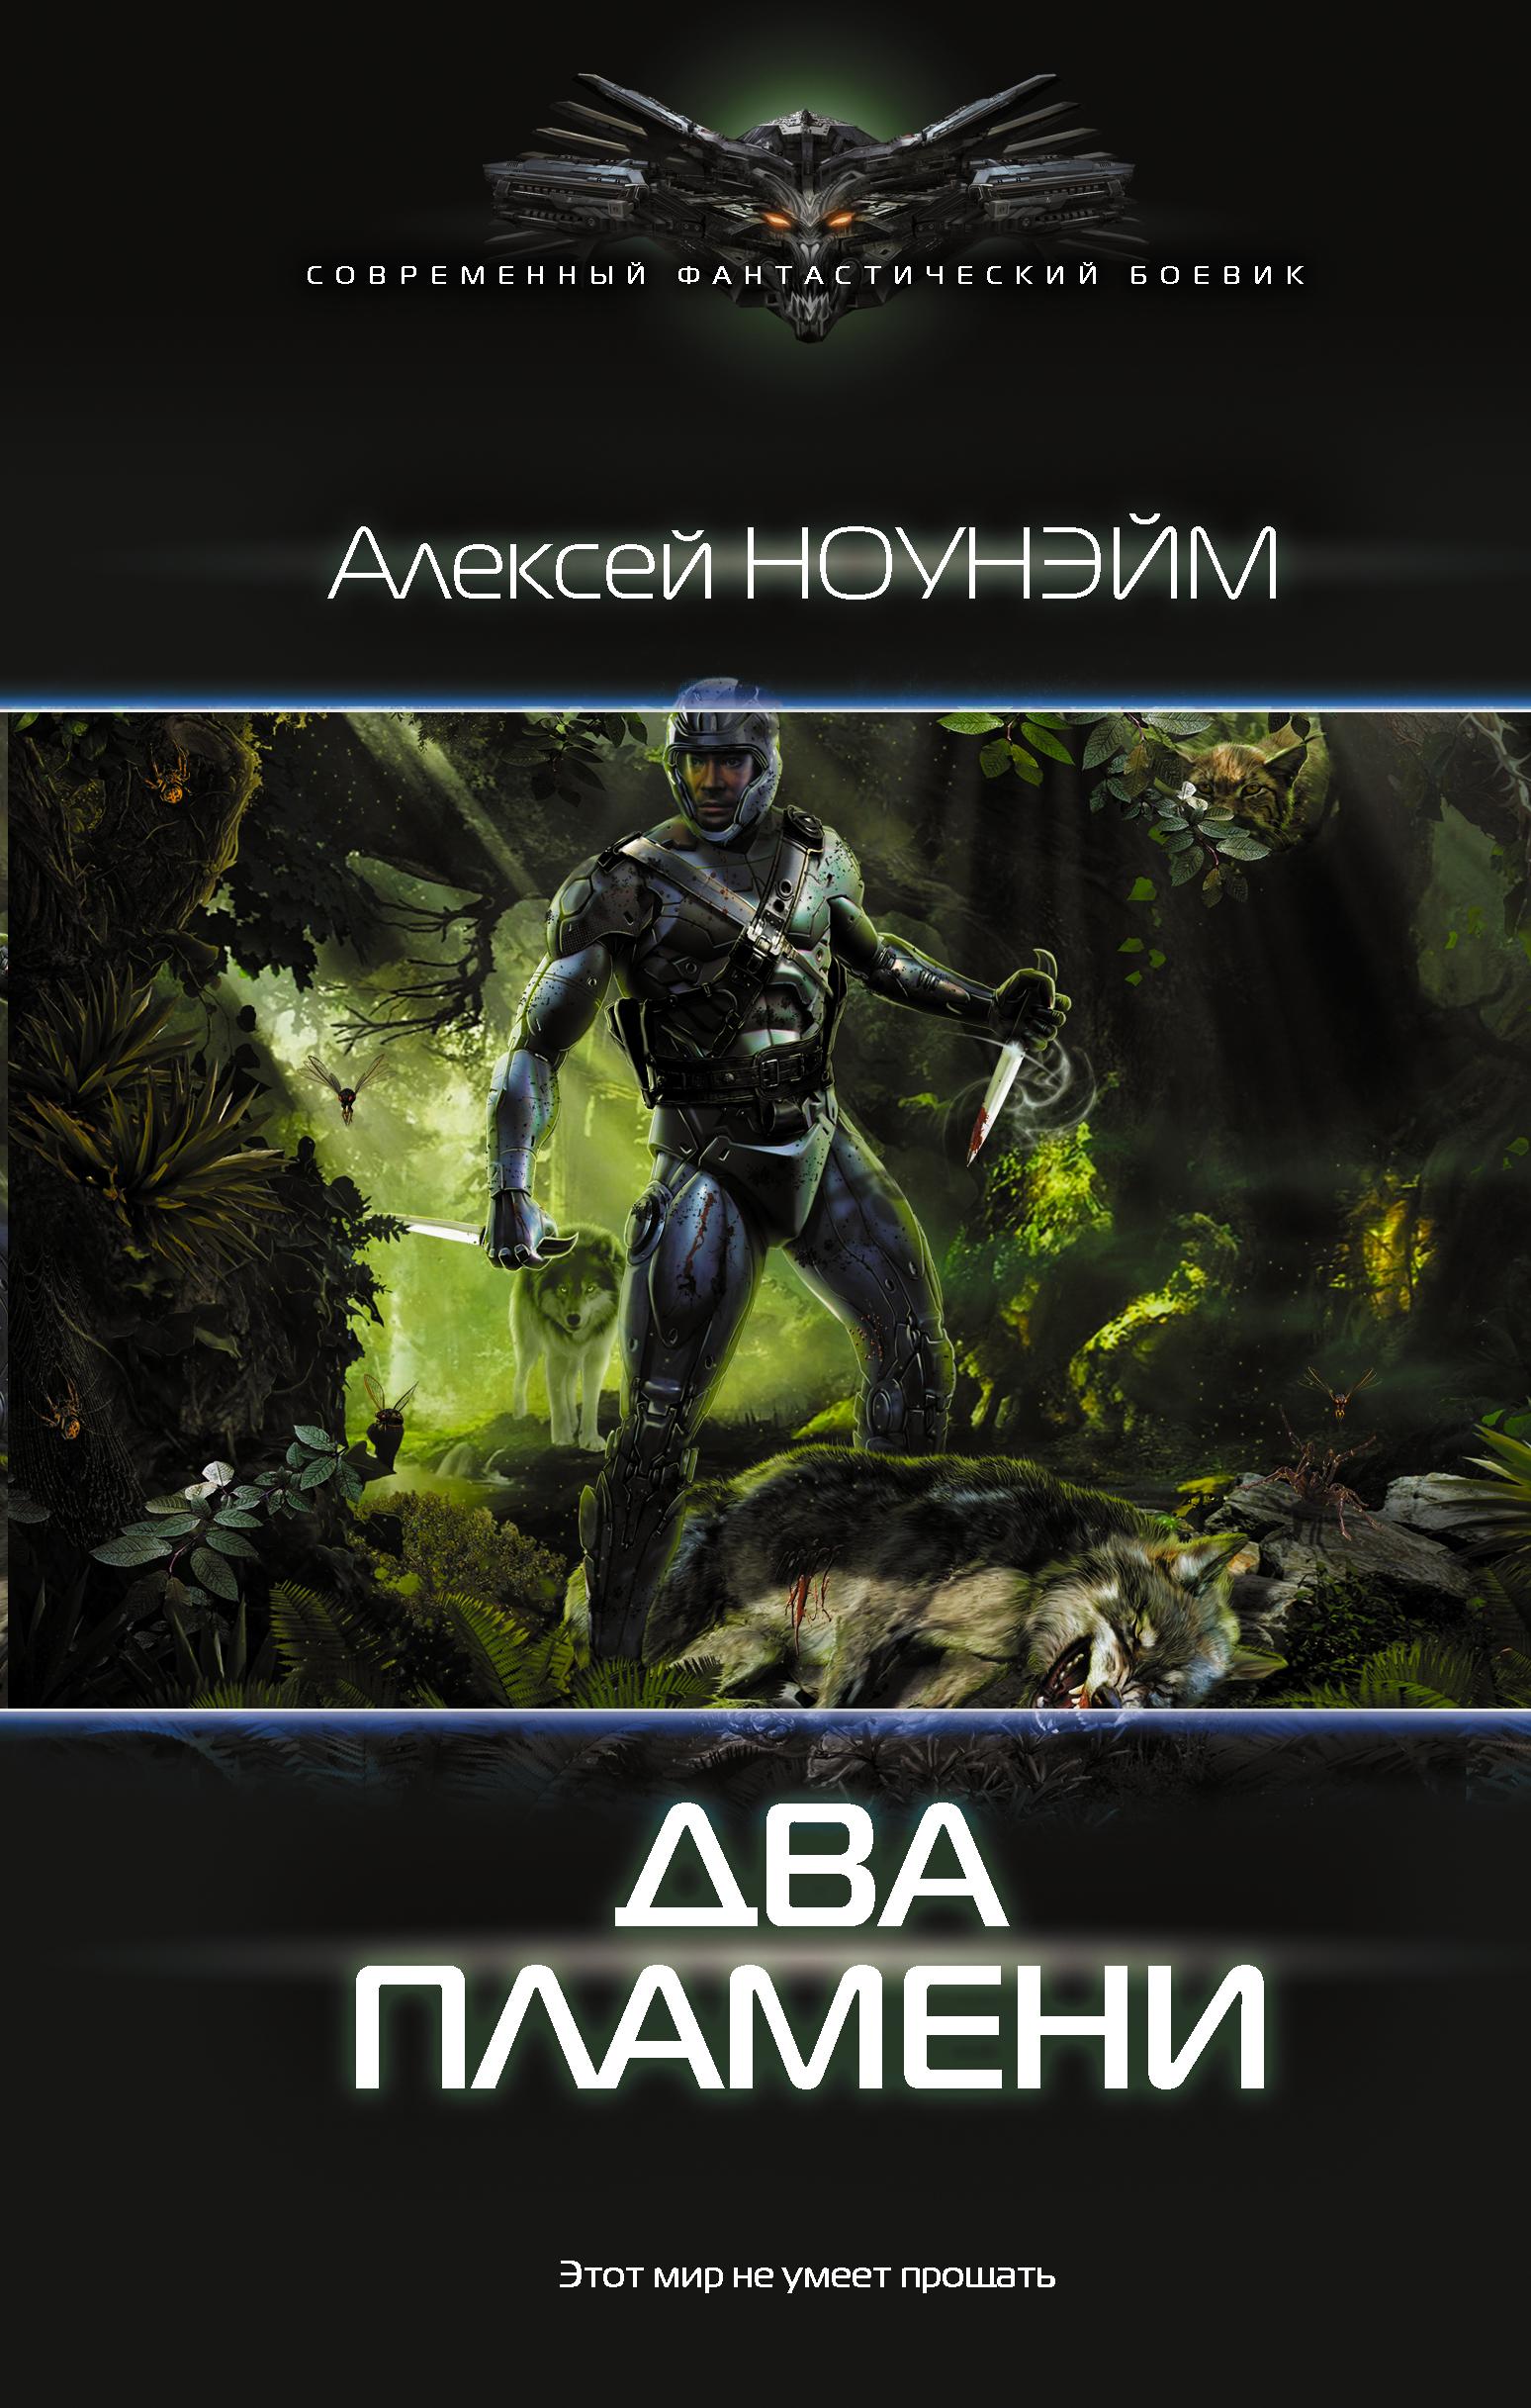 Ноунэйм Алексей Два пламени планета на которой убивают